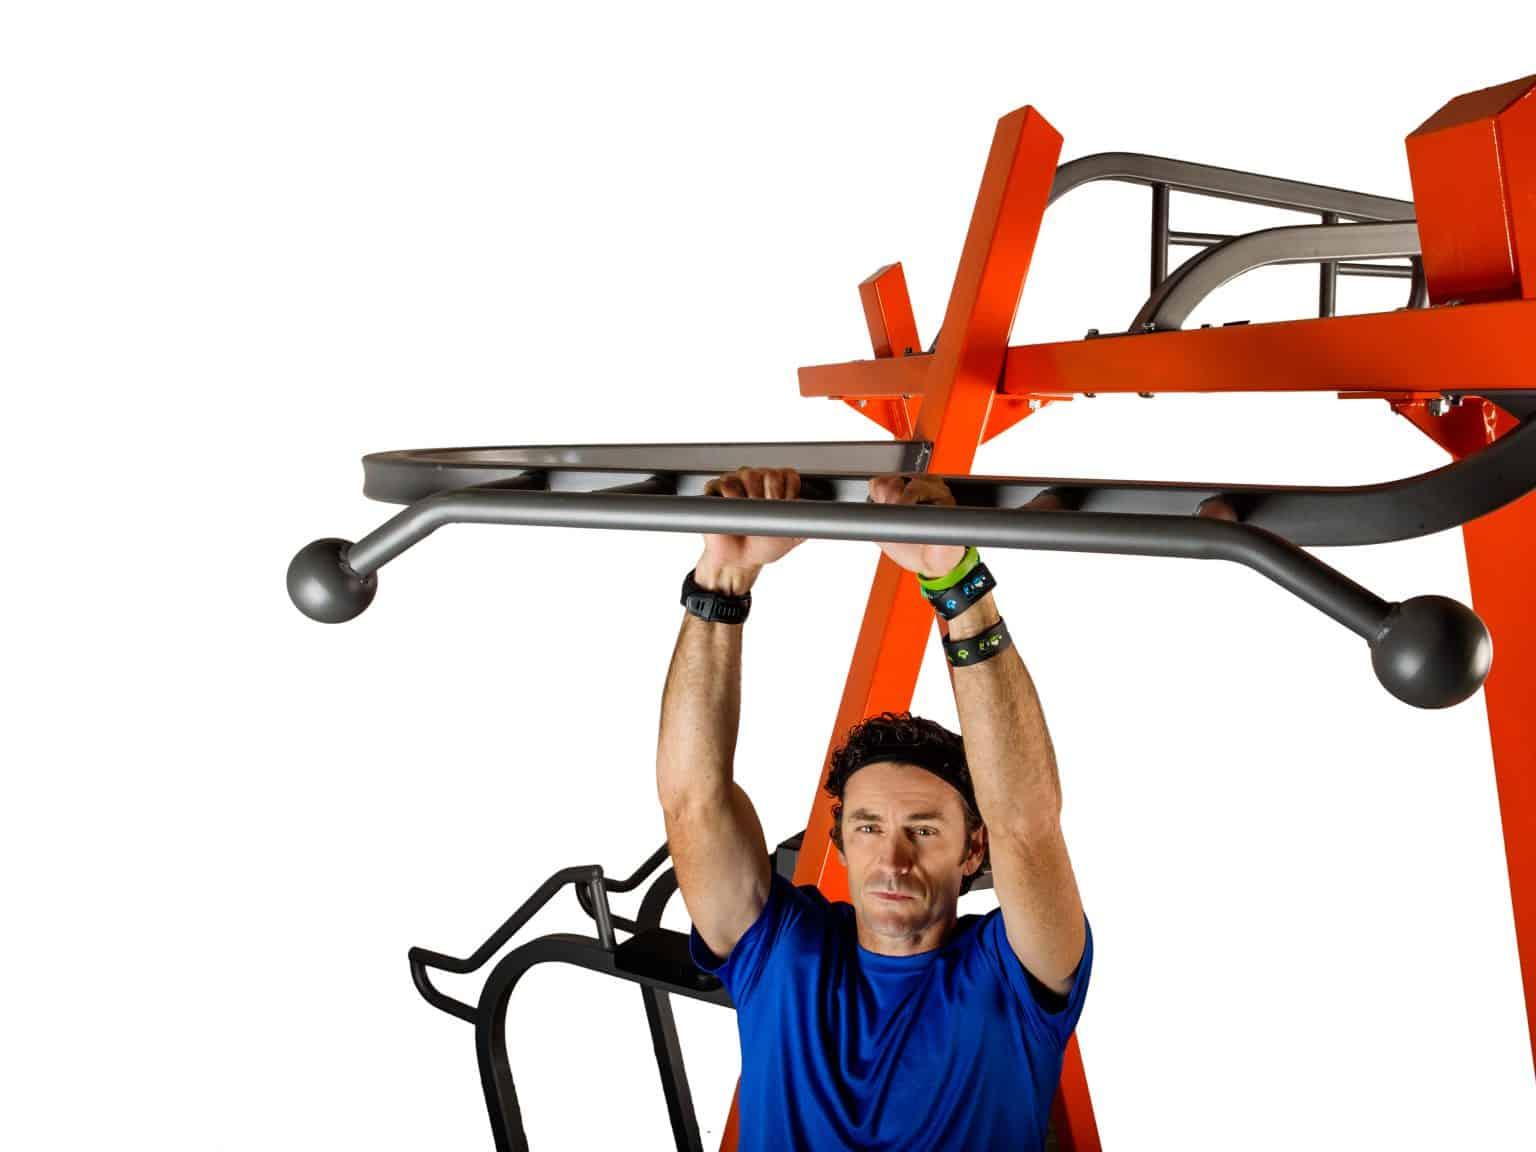 outdoor-fitness-equipment_49644069357_o-1536x1152